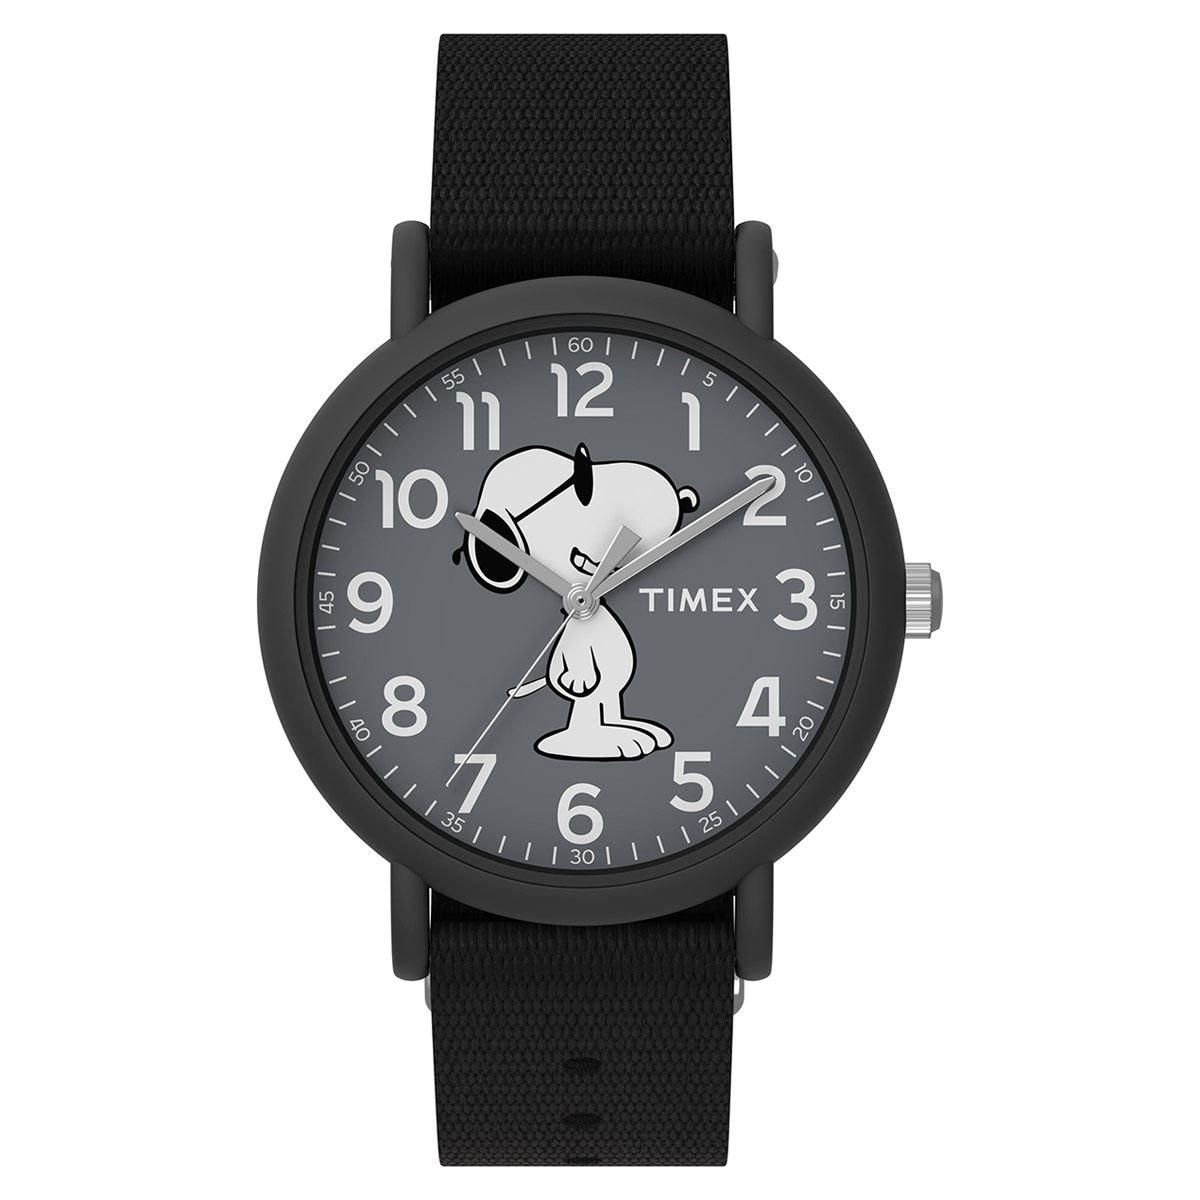 Reloj Timex TW2T65700 Unisex